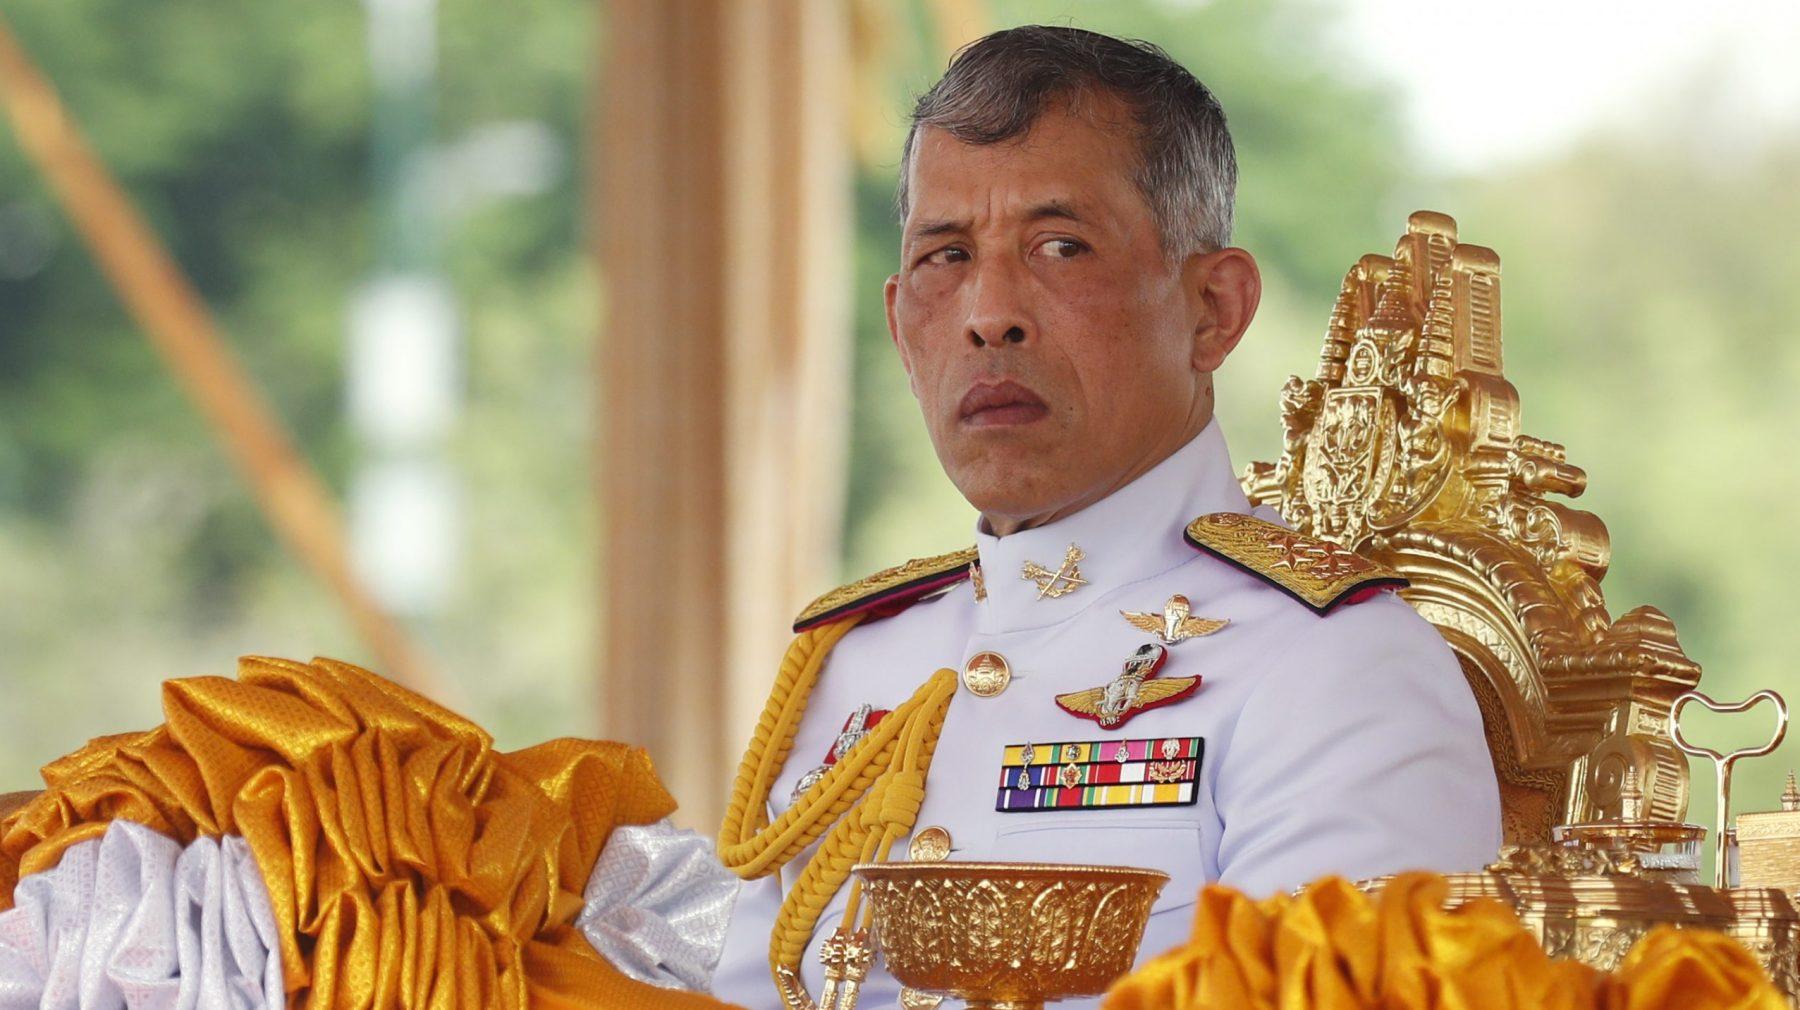 Thaise koning Vajiralongkorn